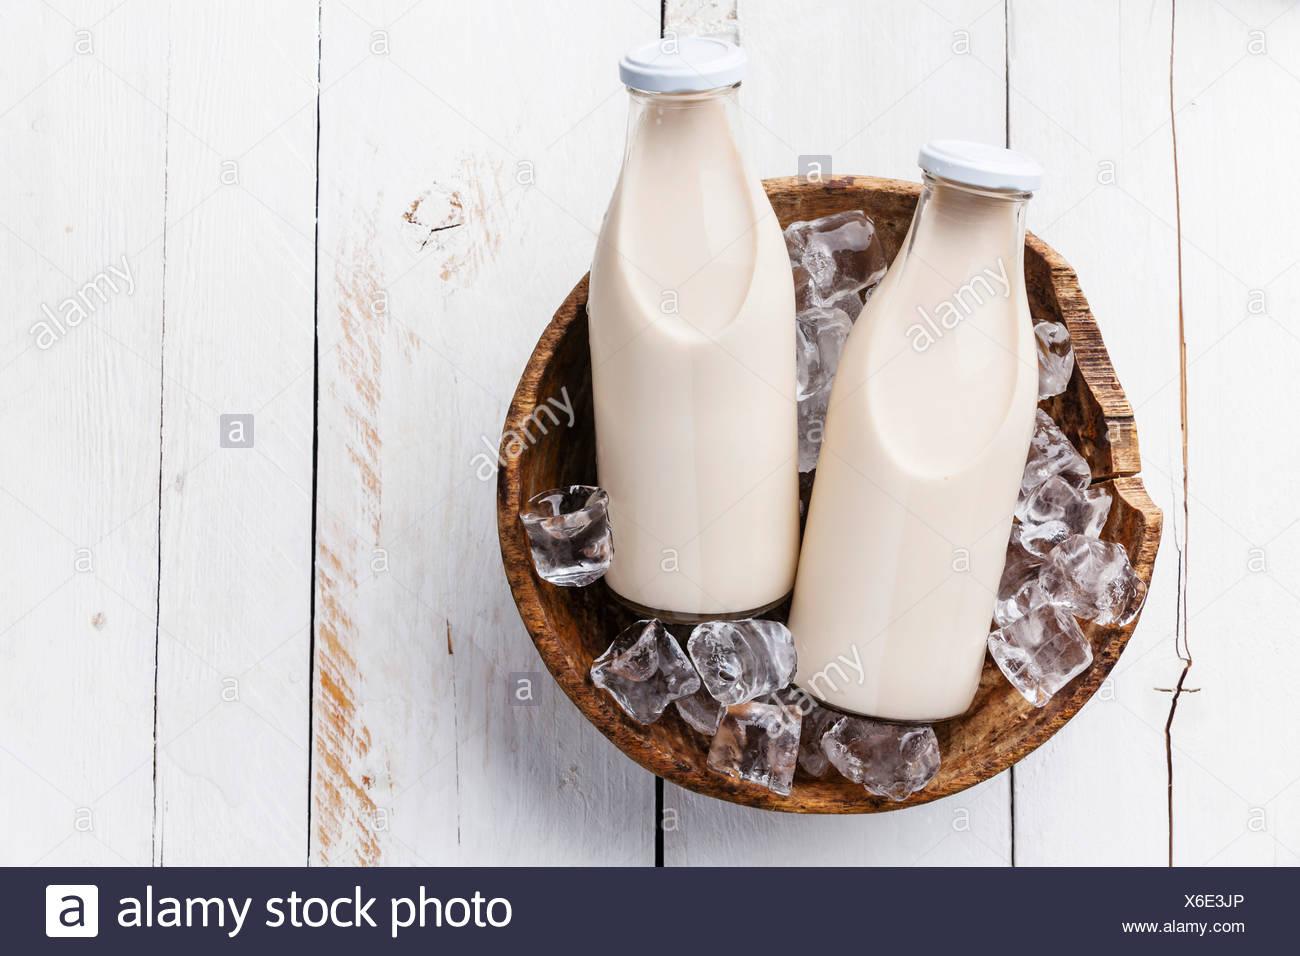 Milk in bottles on ice - Stock Image